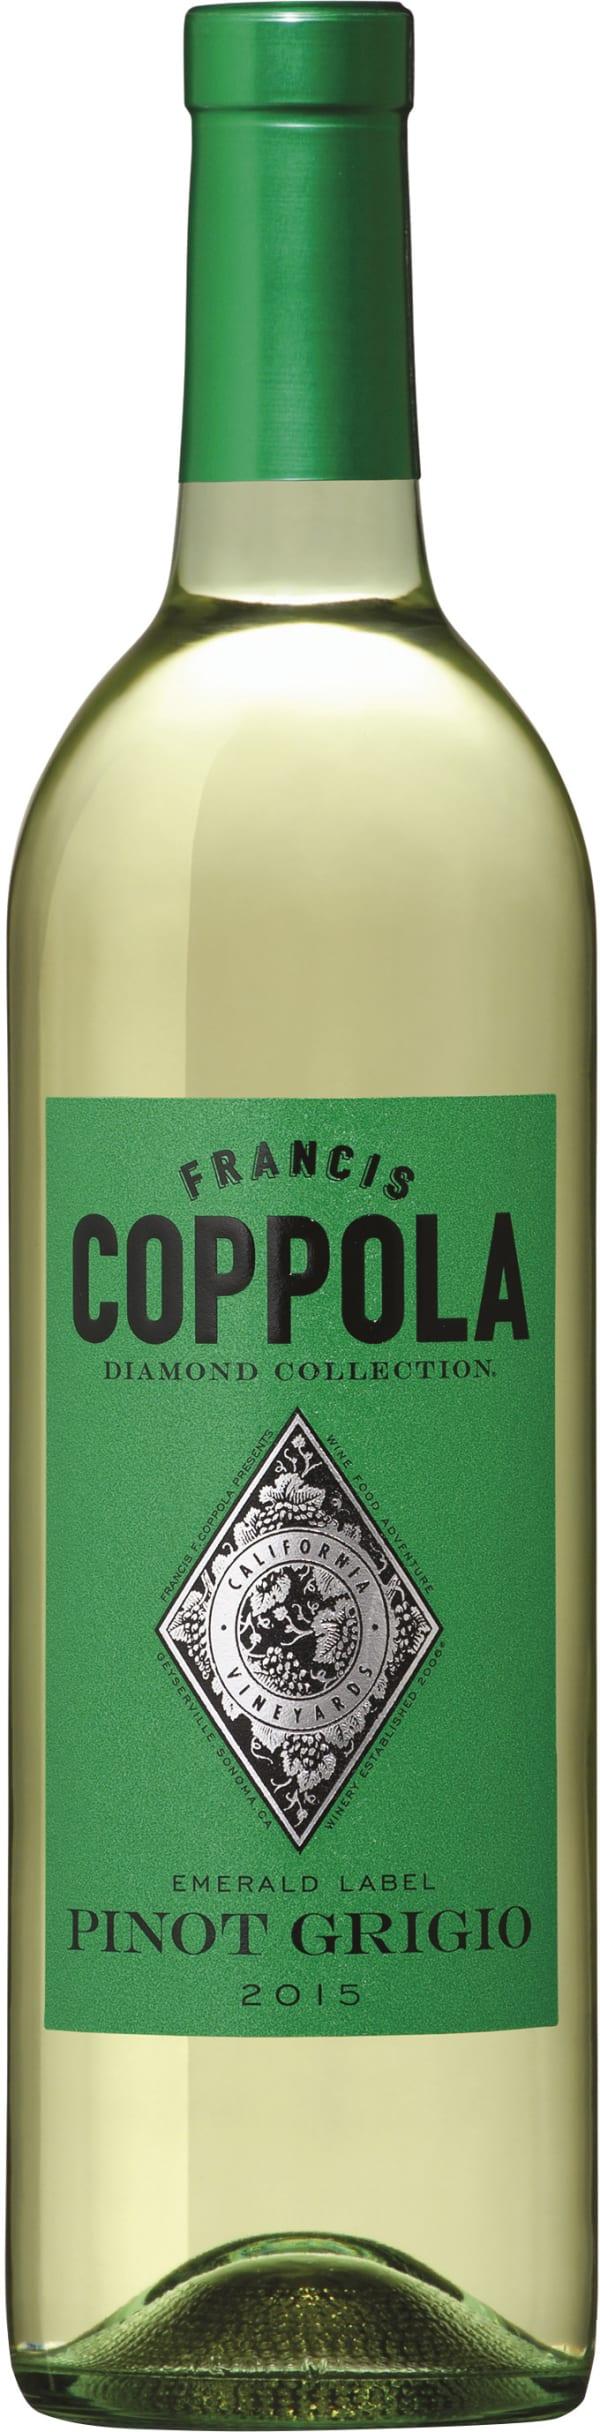 Coppola Diamond Collection Pinot Grigio 2014